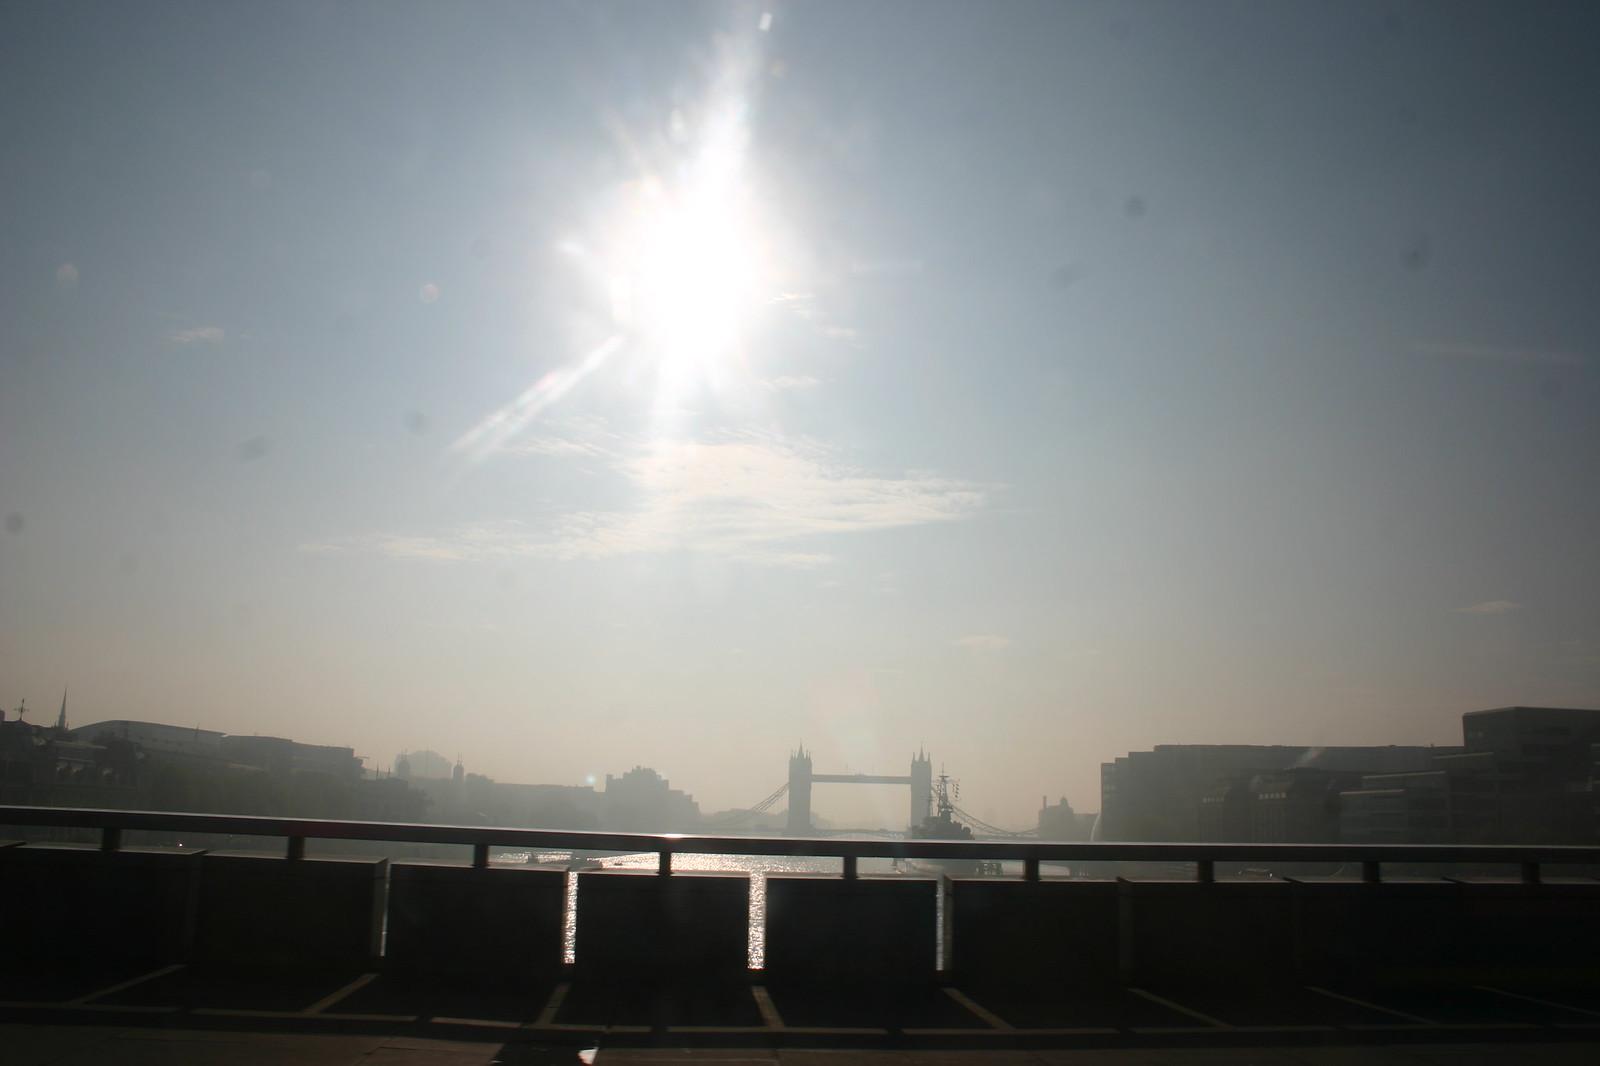 Sunshiney Smoggy Morning 8.30 am Good Friday, London Bridge View